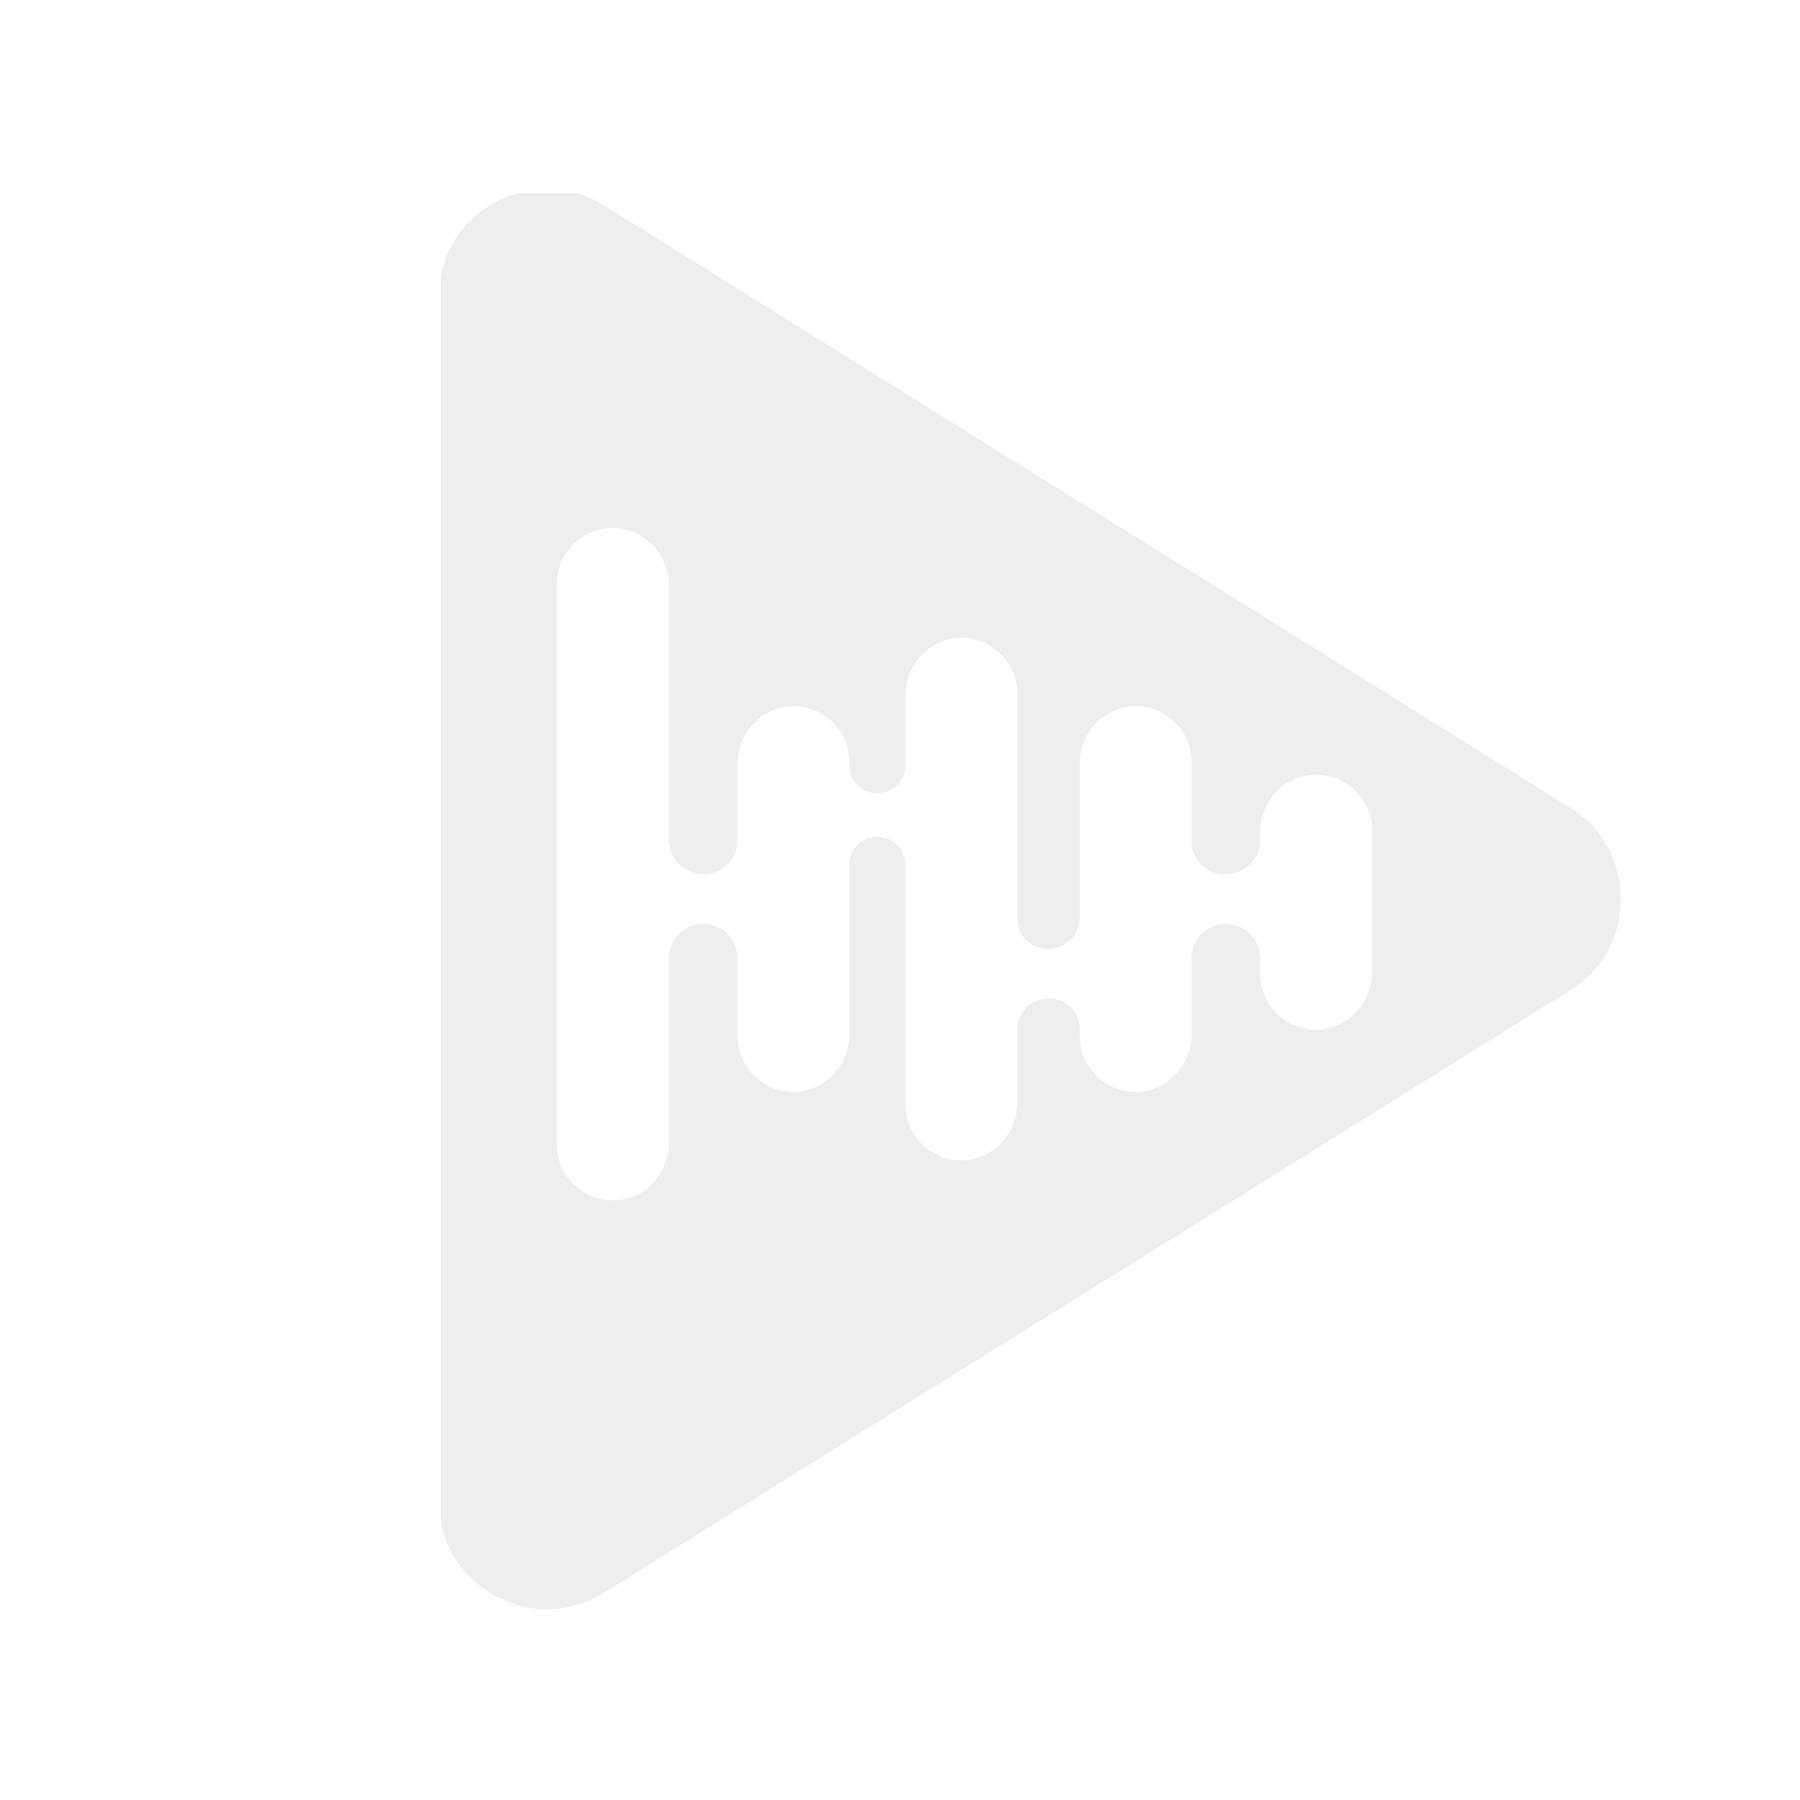 Phonocar VM279 - Biltilpasset ryggekamera